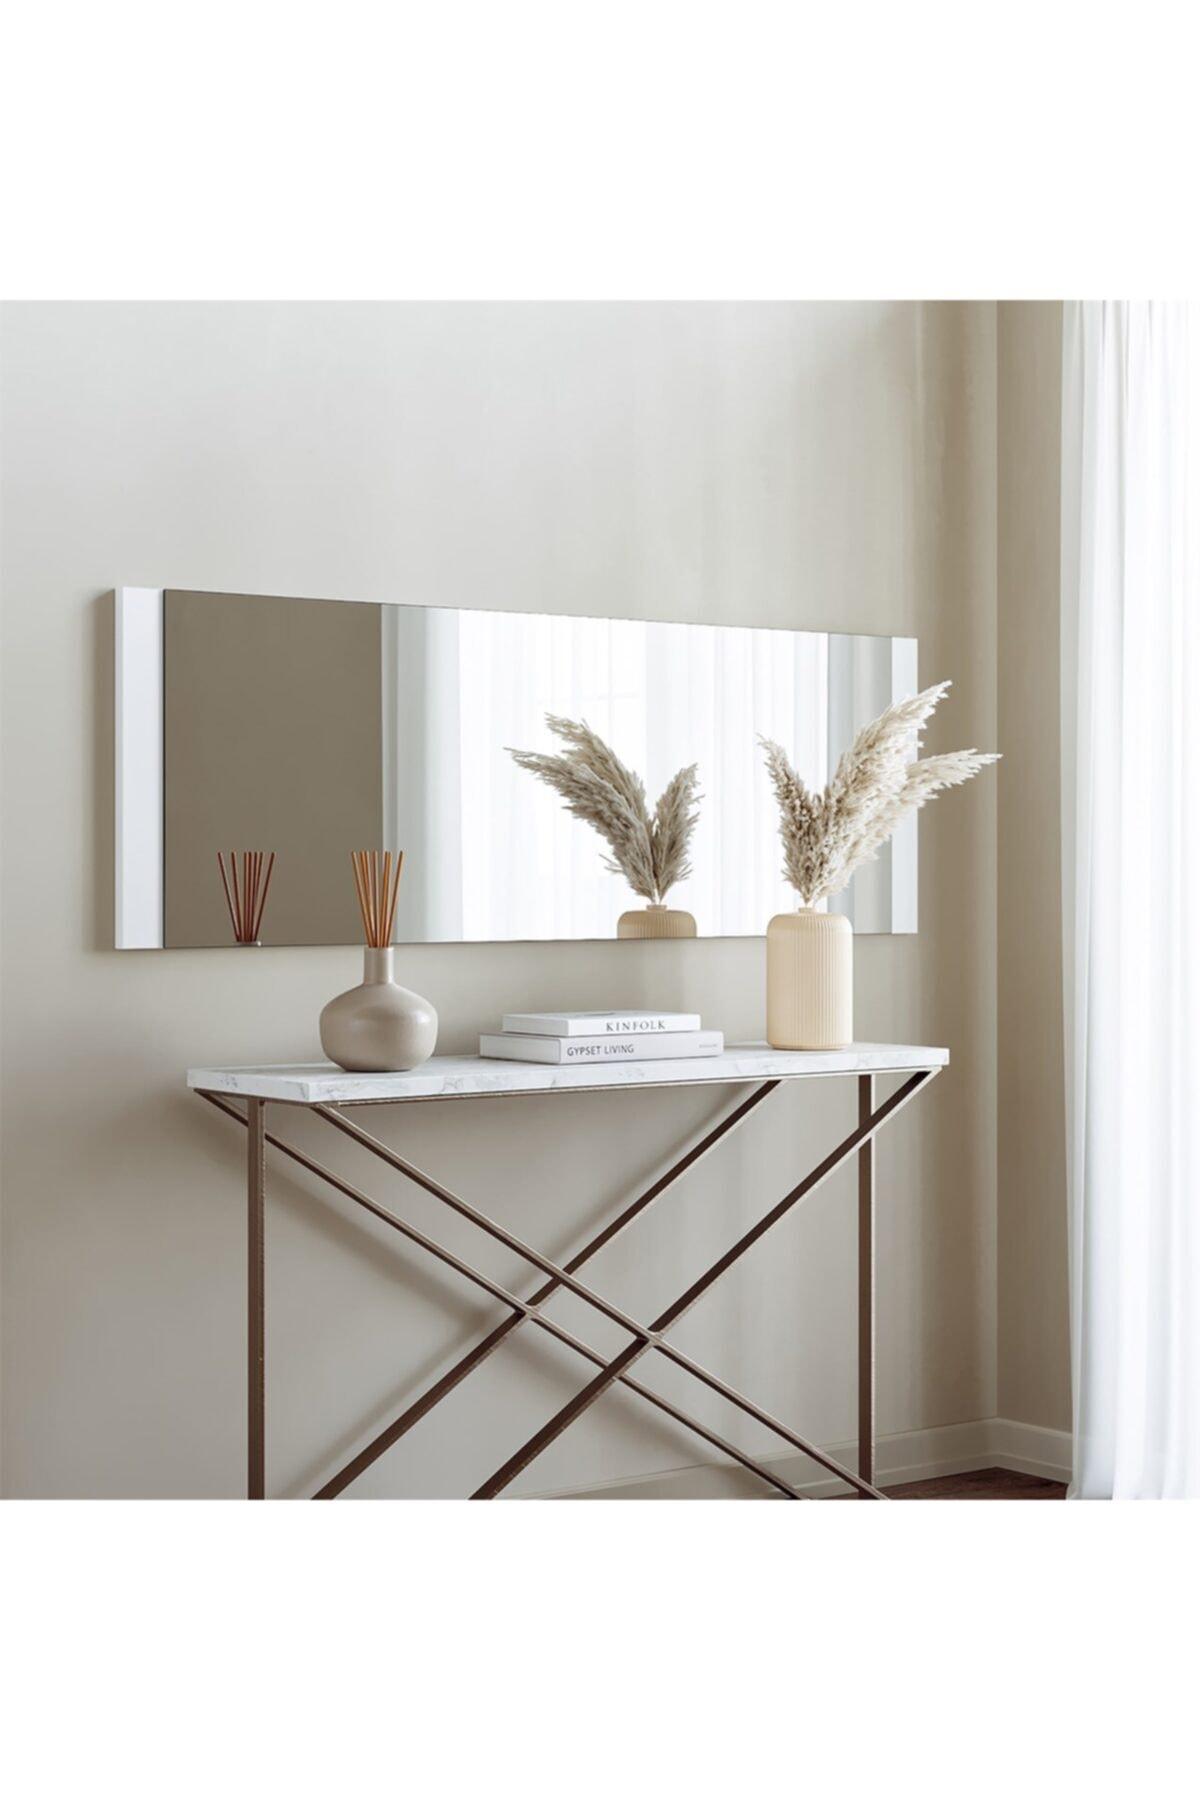 NEOstill Boy Aynası Dekoratif Basic 40x120 cm 2